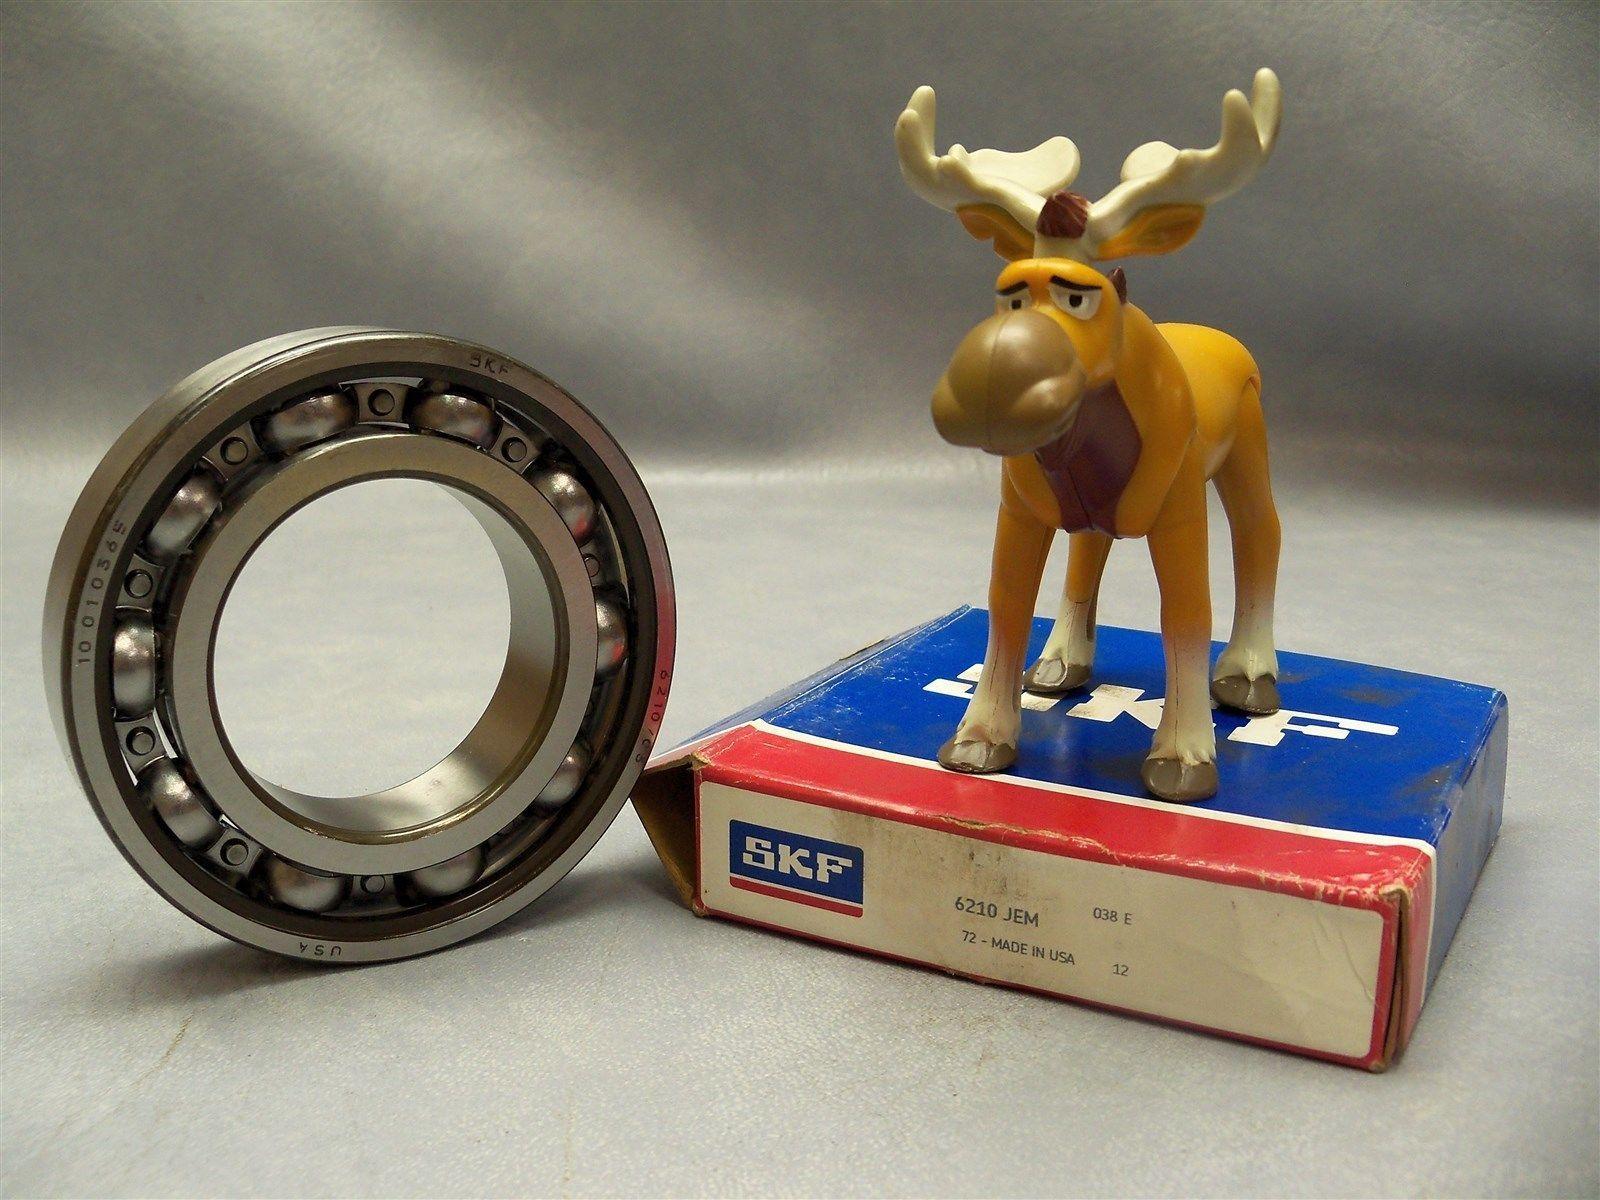 Skf 6210 Jem Bearing and 10 similar items